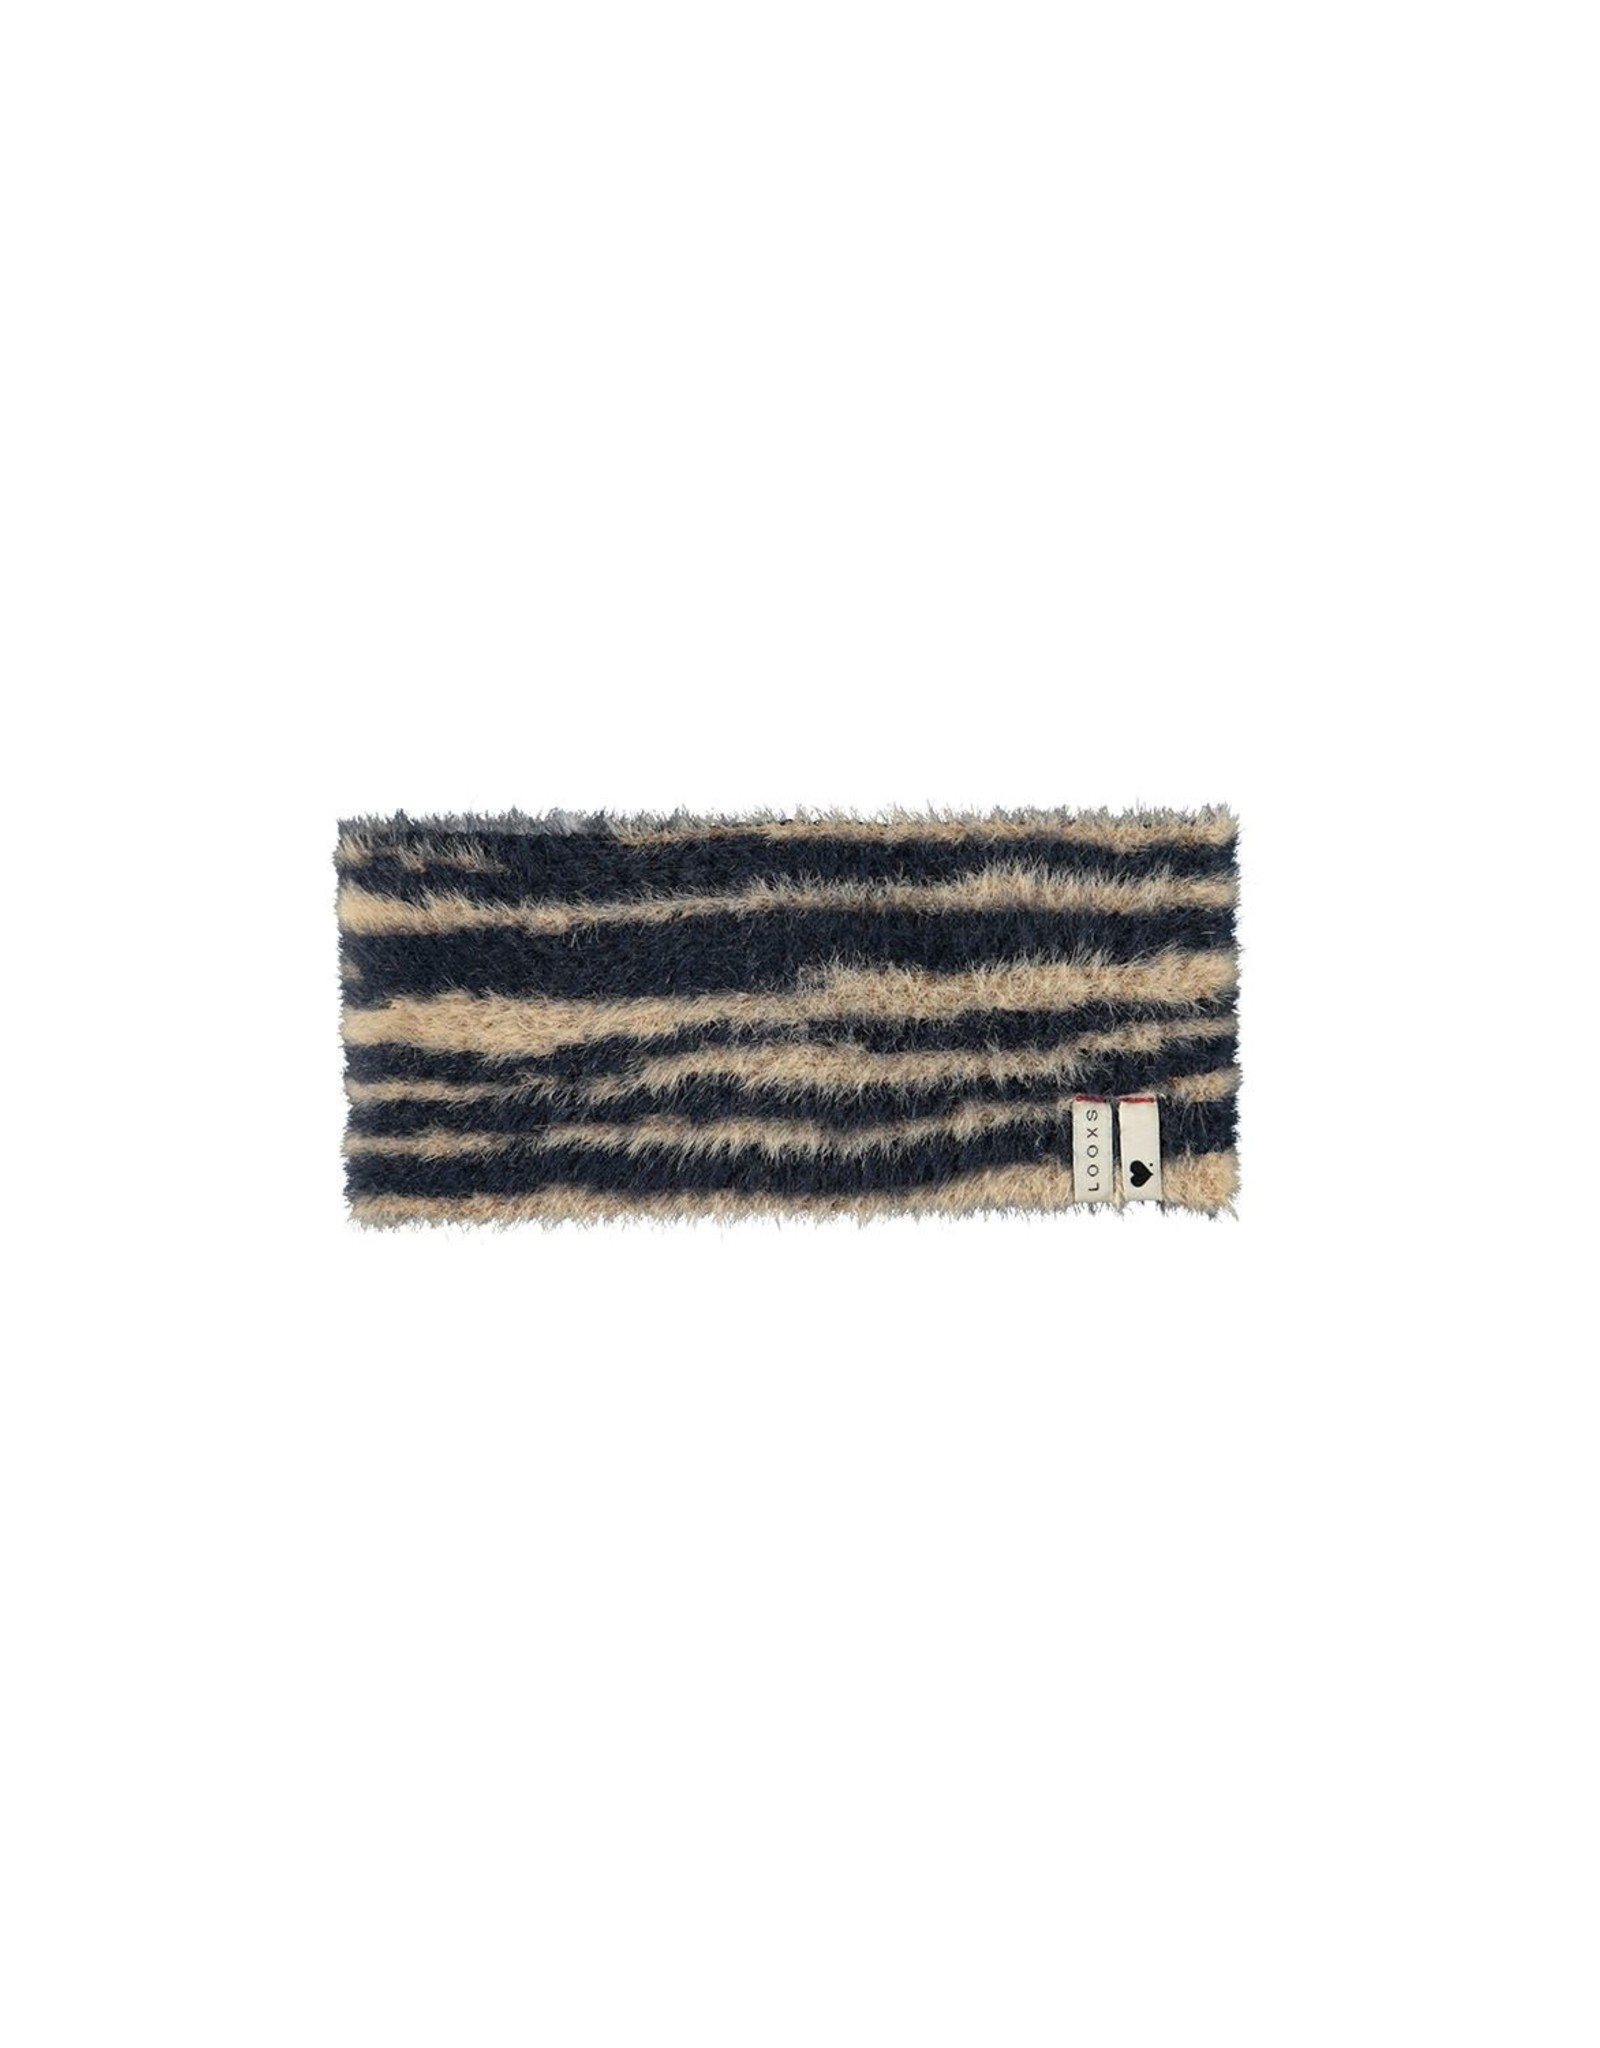 Looxs Little Little collar hairy knit zebra